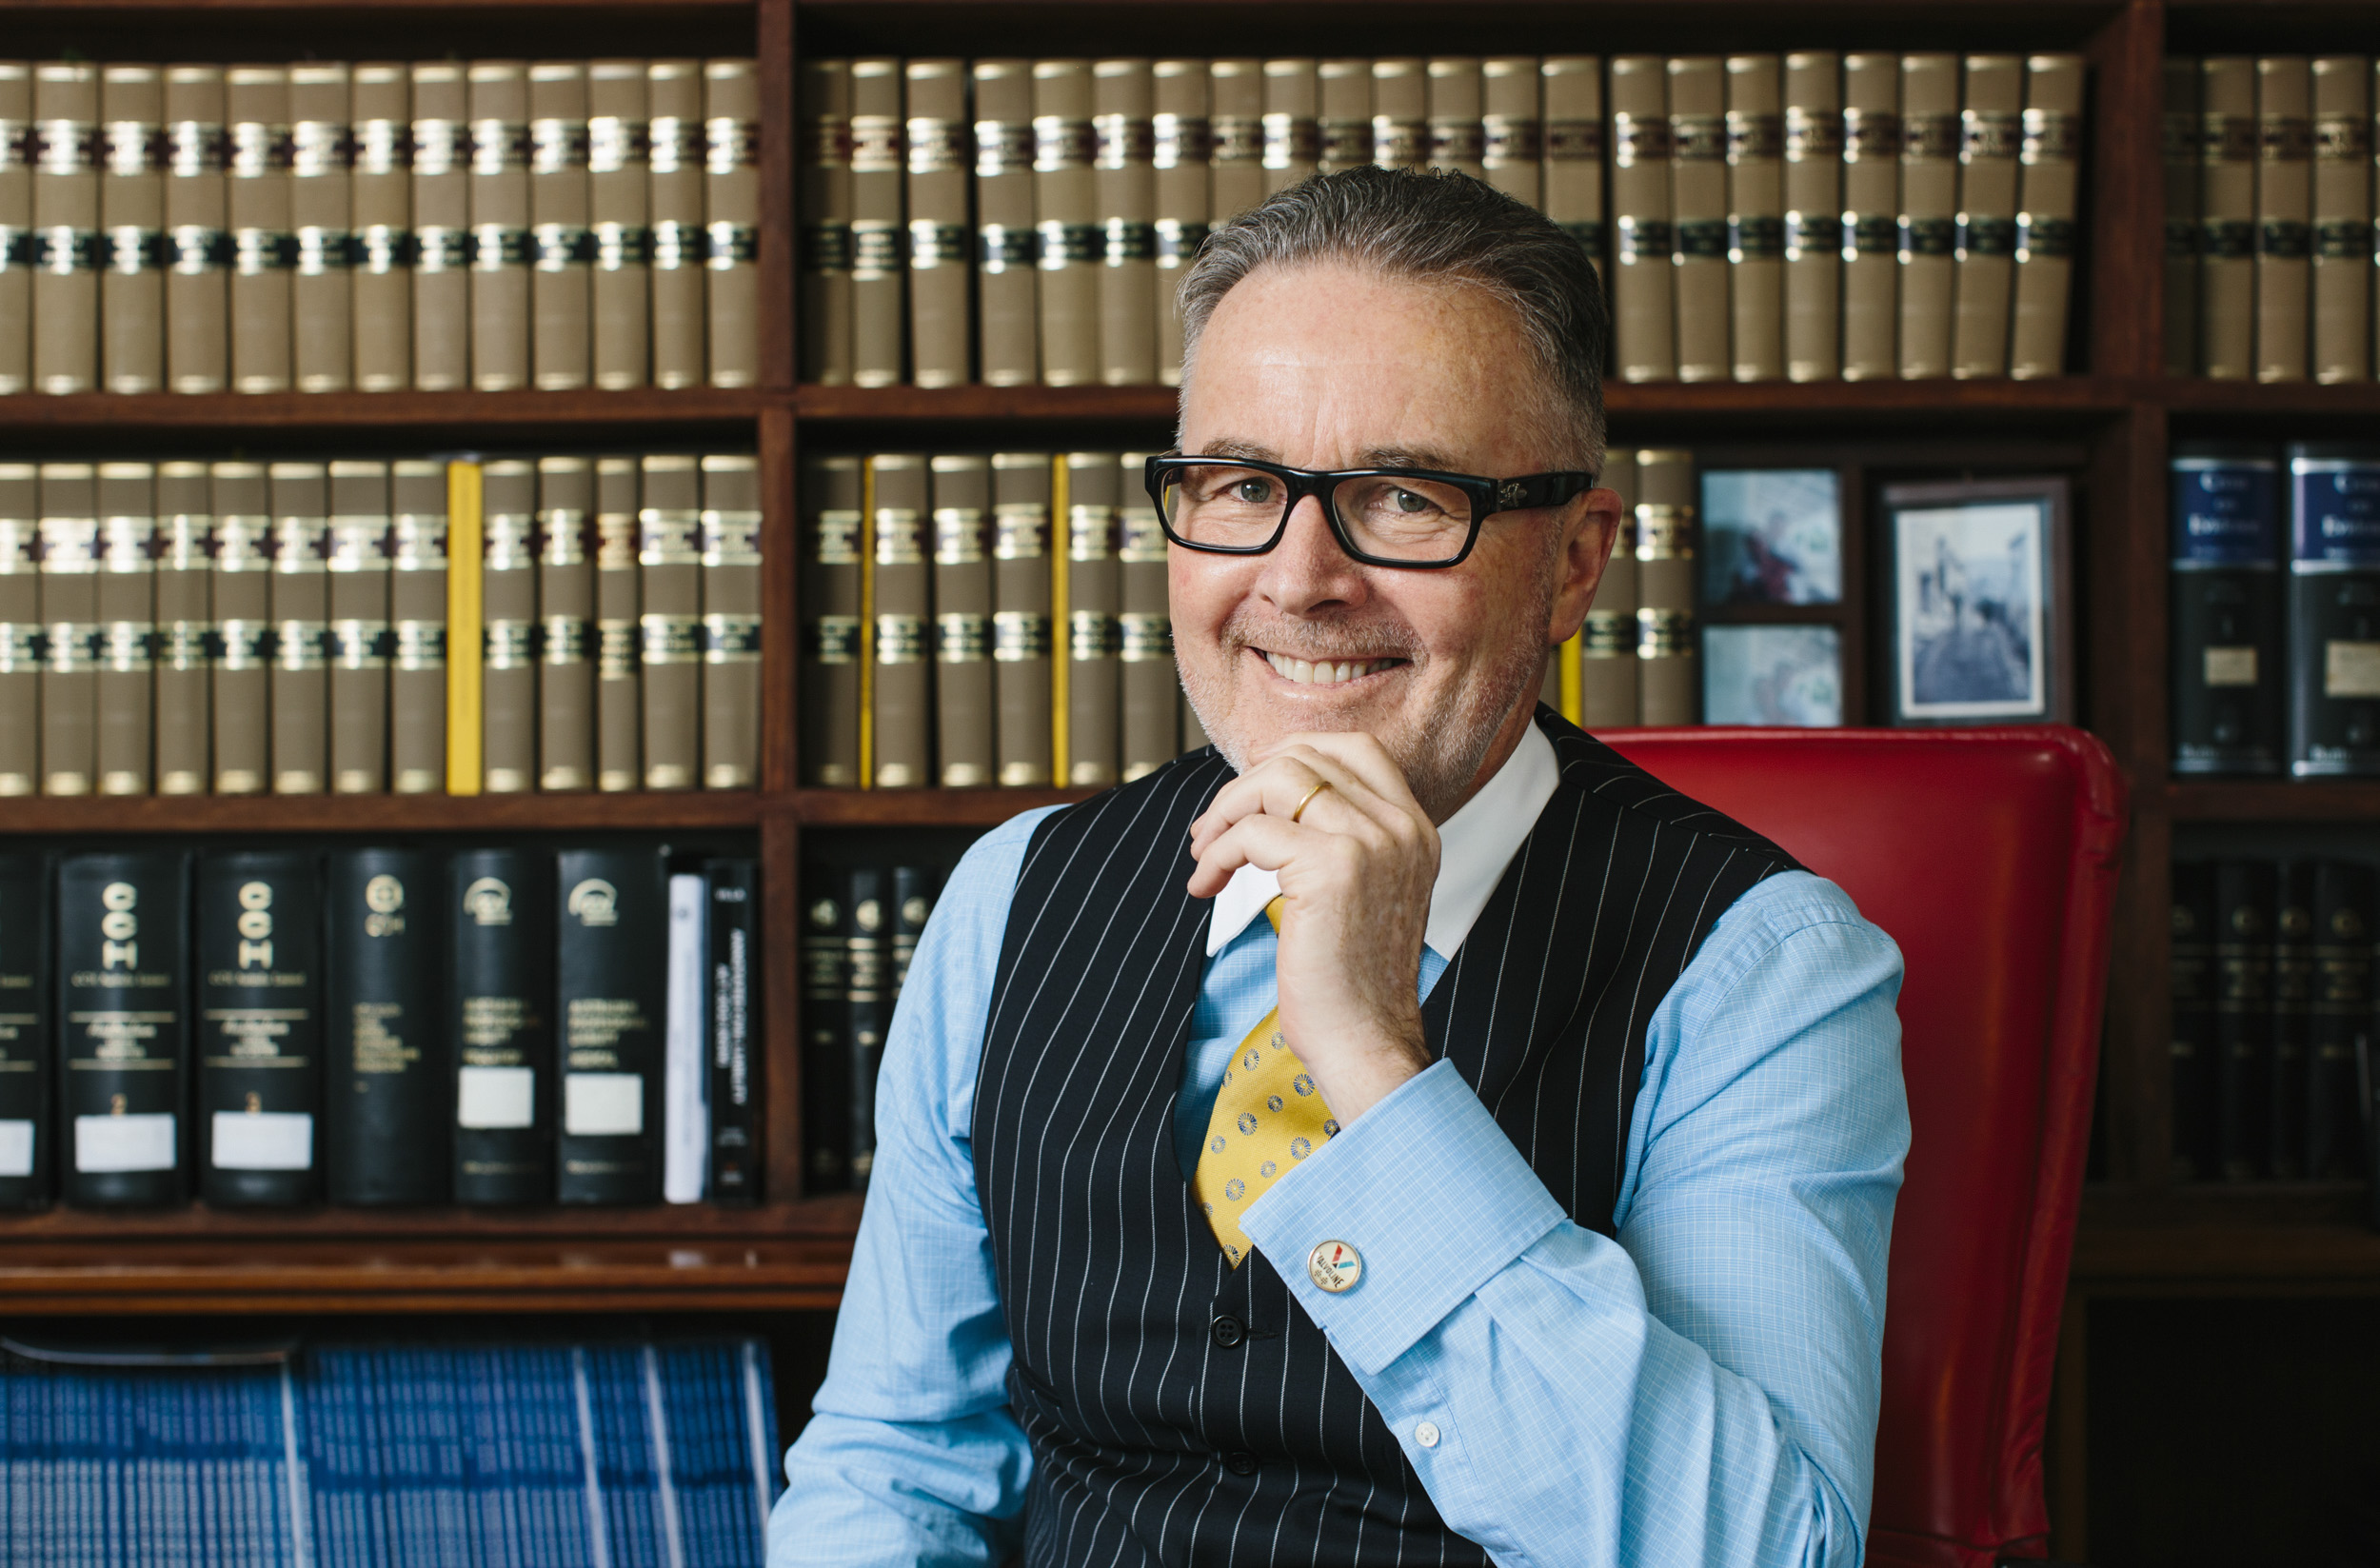 barrister-portrait-Sydney-Australia_06.jpg